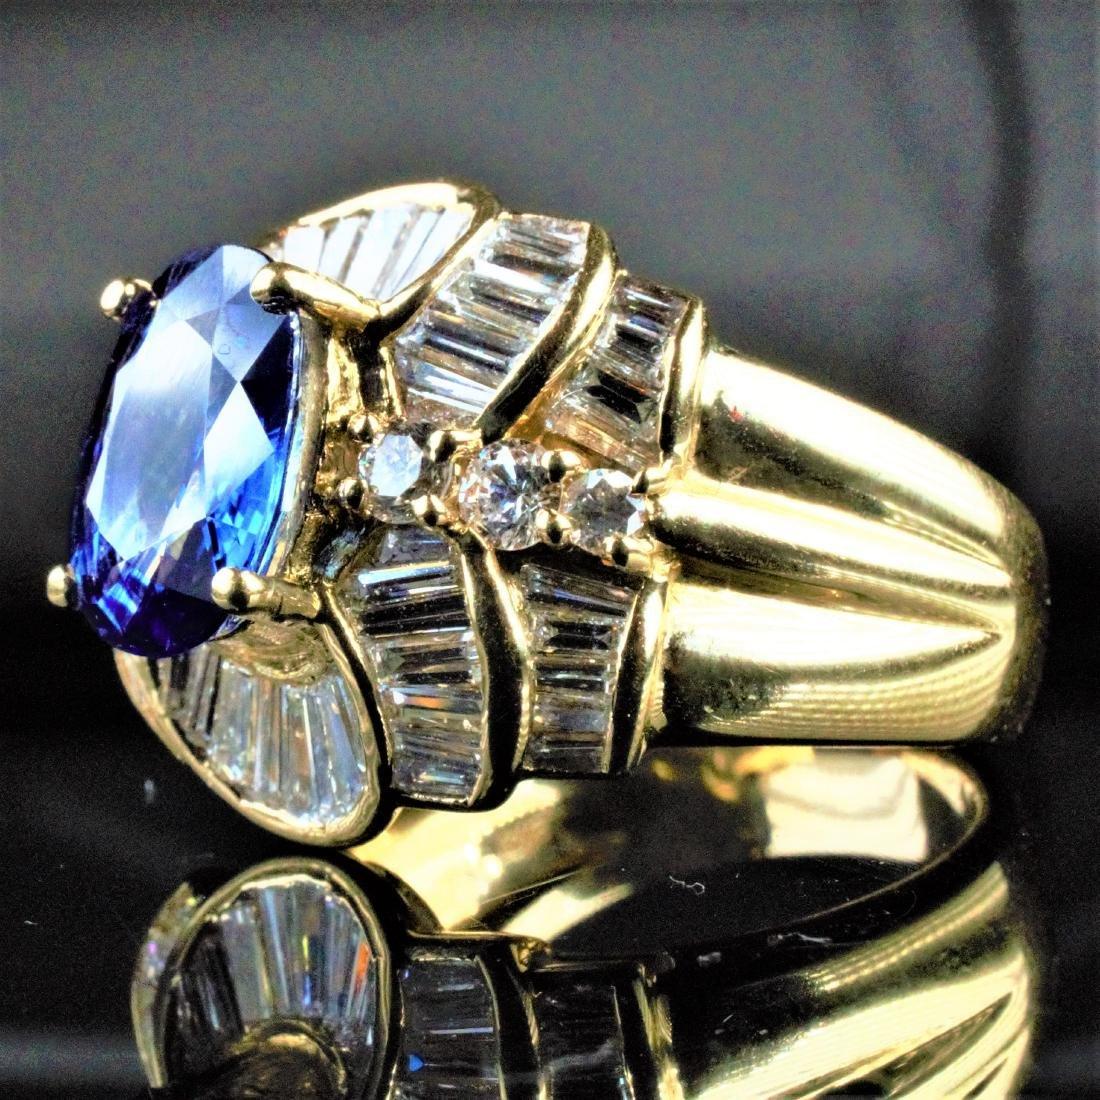 14k YG 2.25 CT Sapphire and Diamond Ring sz7 - 3